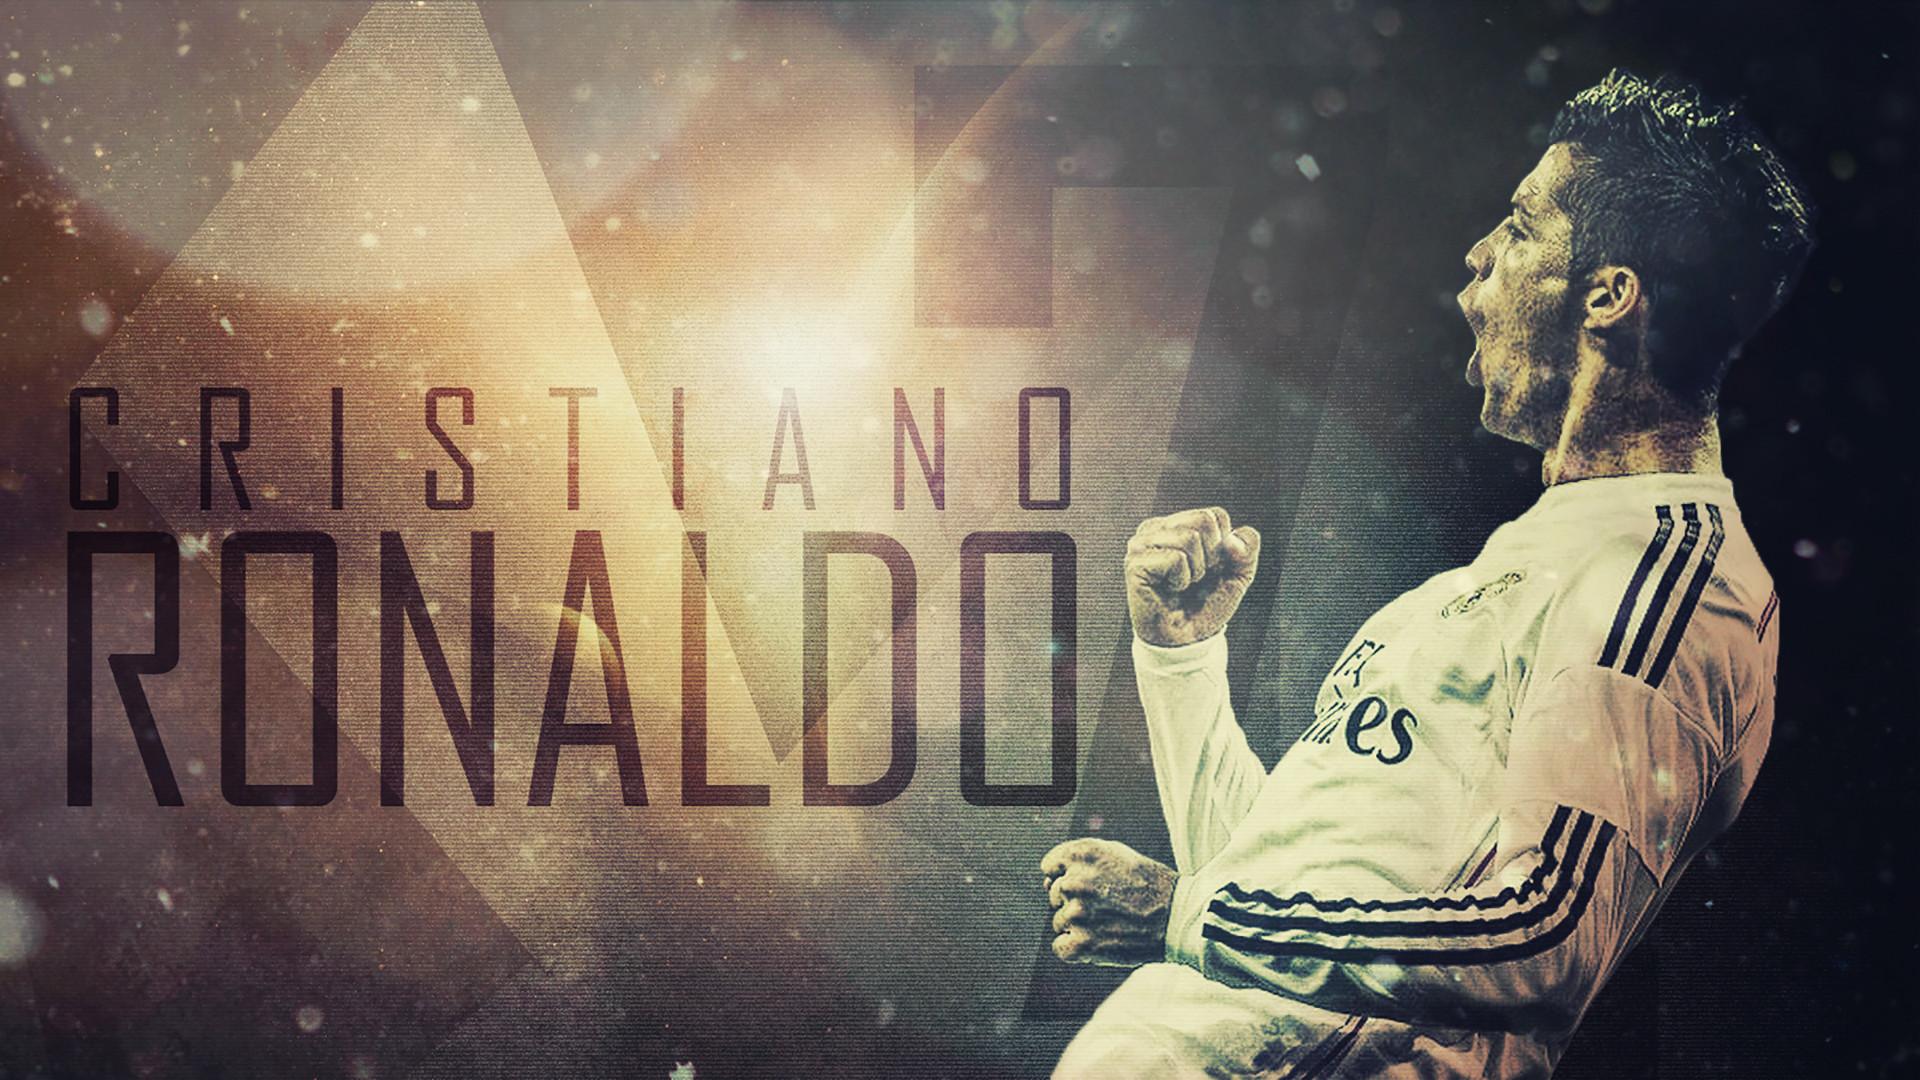 Cristiano-Ronaldo-CR7-HD-Wallpapers-Free-Download-Wallpaperxyz.